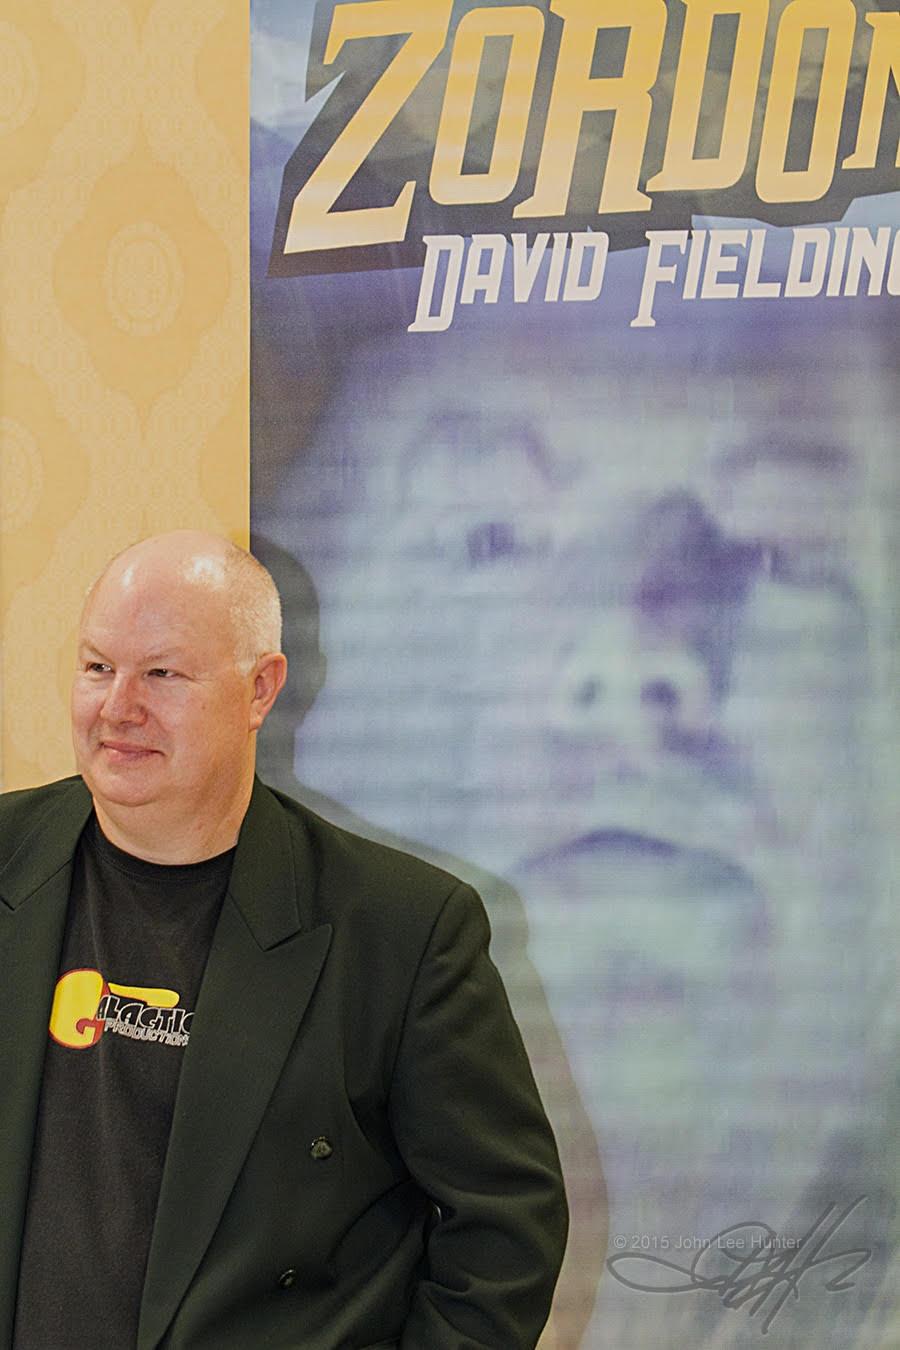 David Fielding